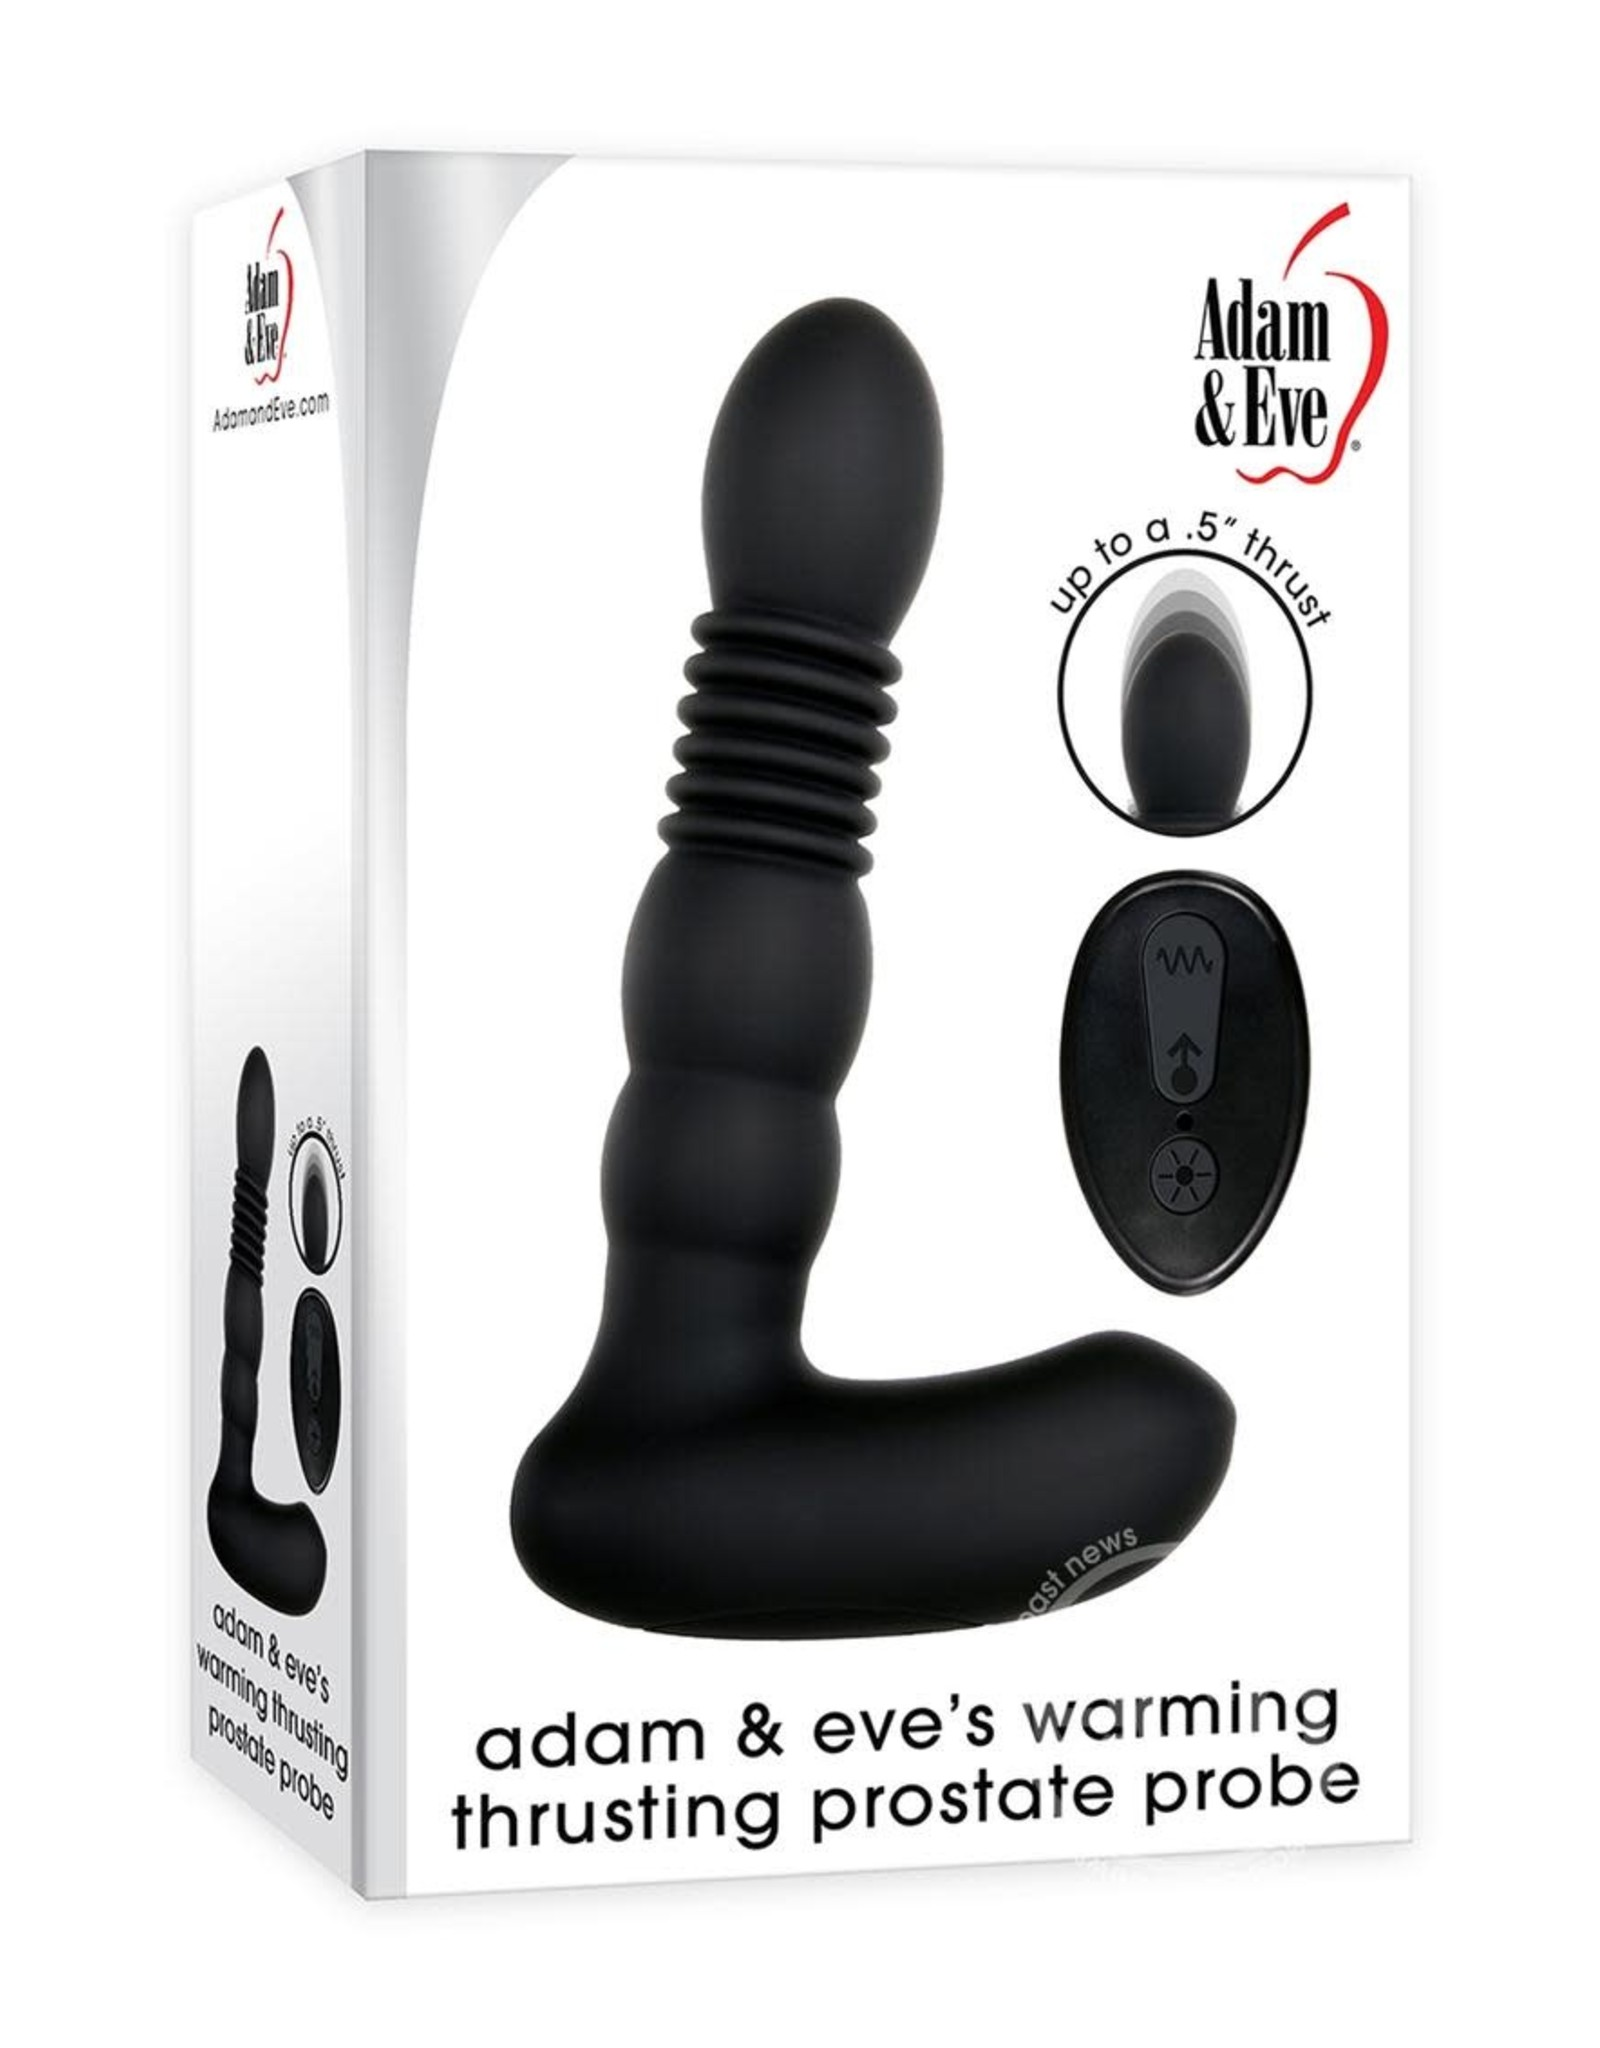 ADAM & EVE ADAM & EVES WARMING THRUSTING PROSTATE PROBE